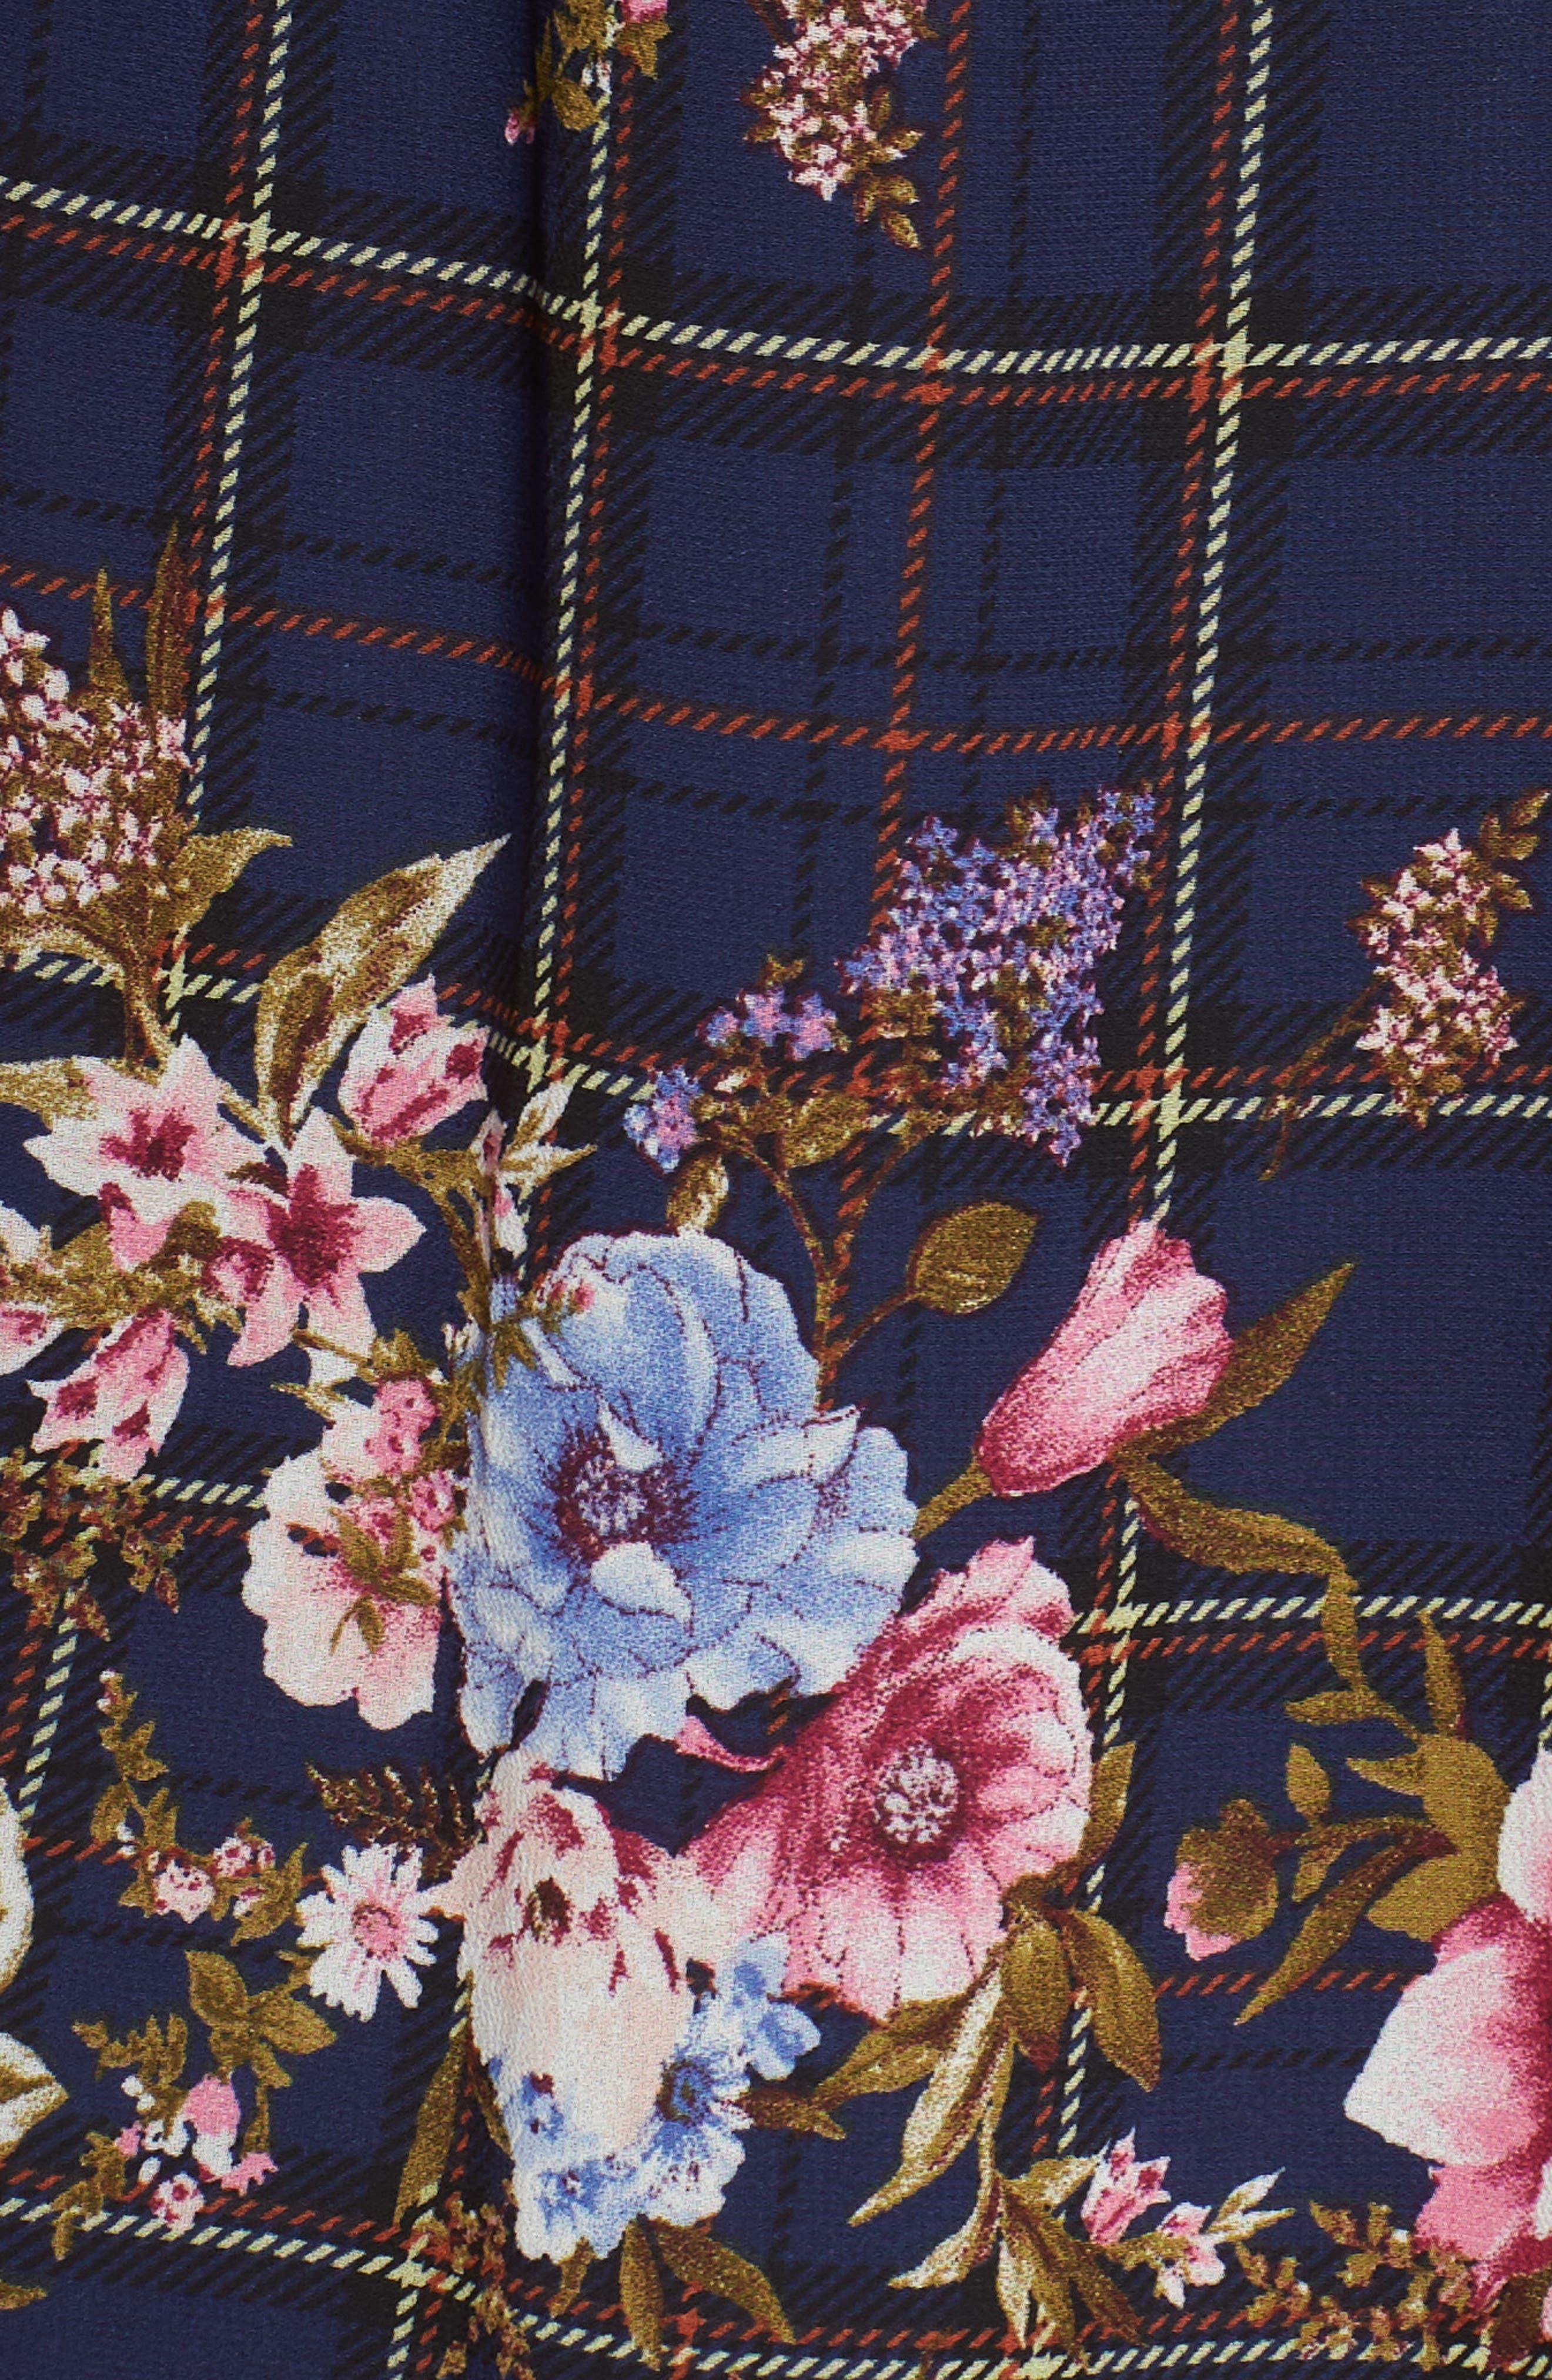 Three-Bow Long Sleeve Dress,                             Alternate thumbnail 6, color,                             NAVY PLAID FLORAL